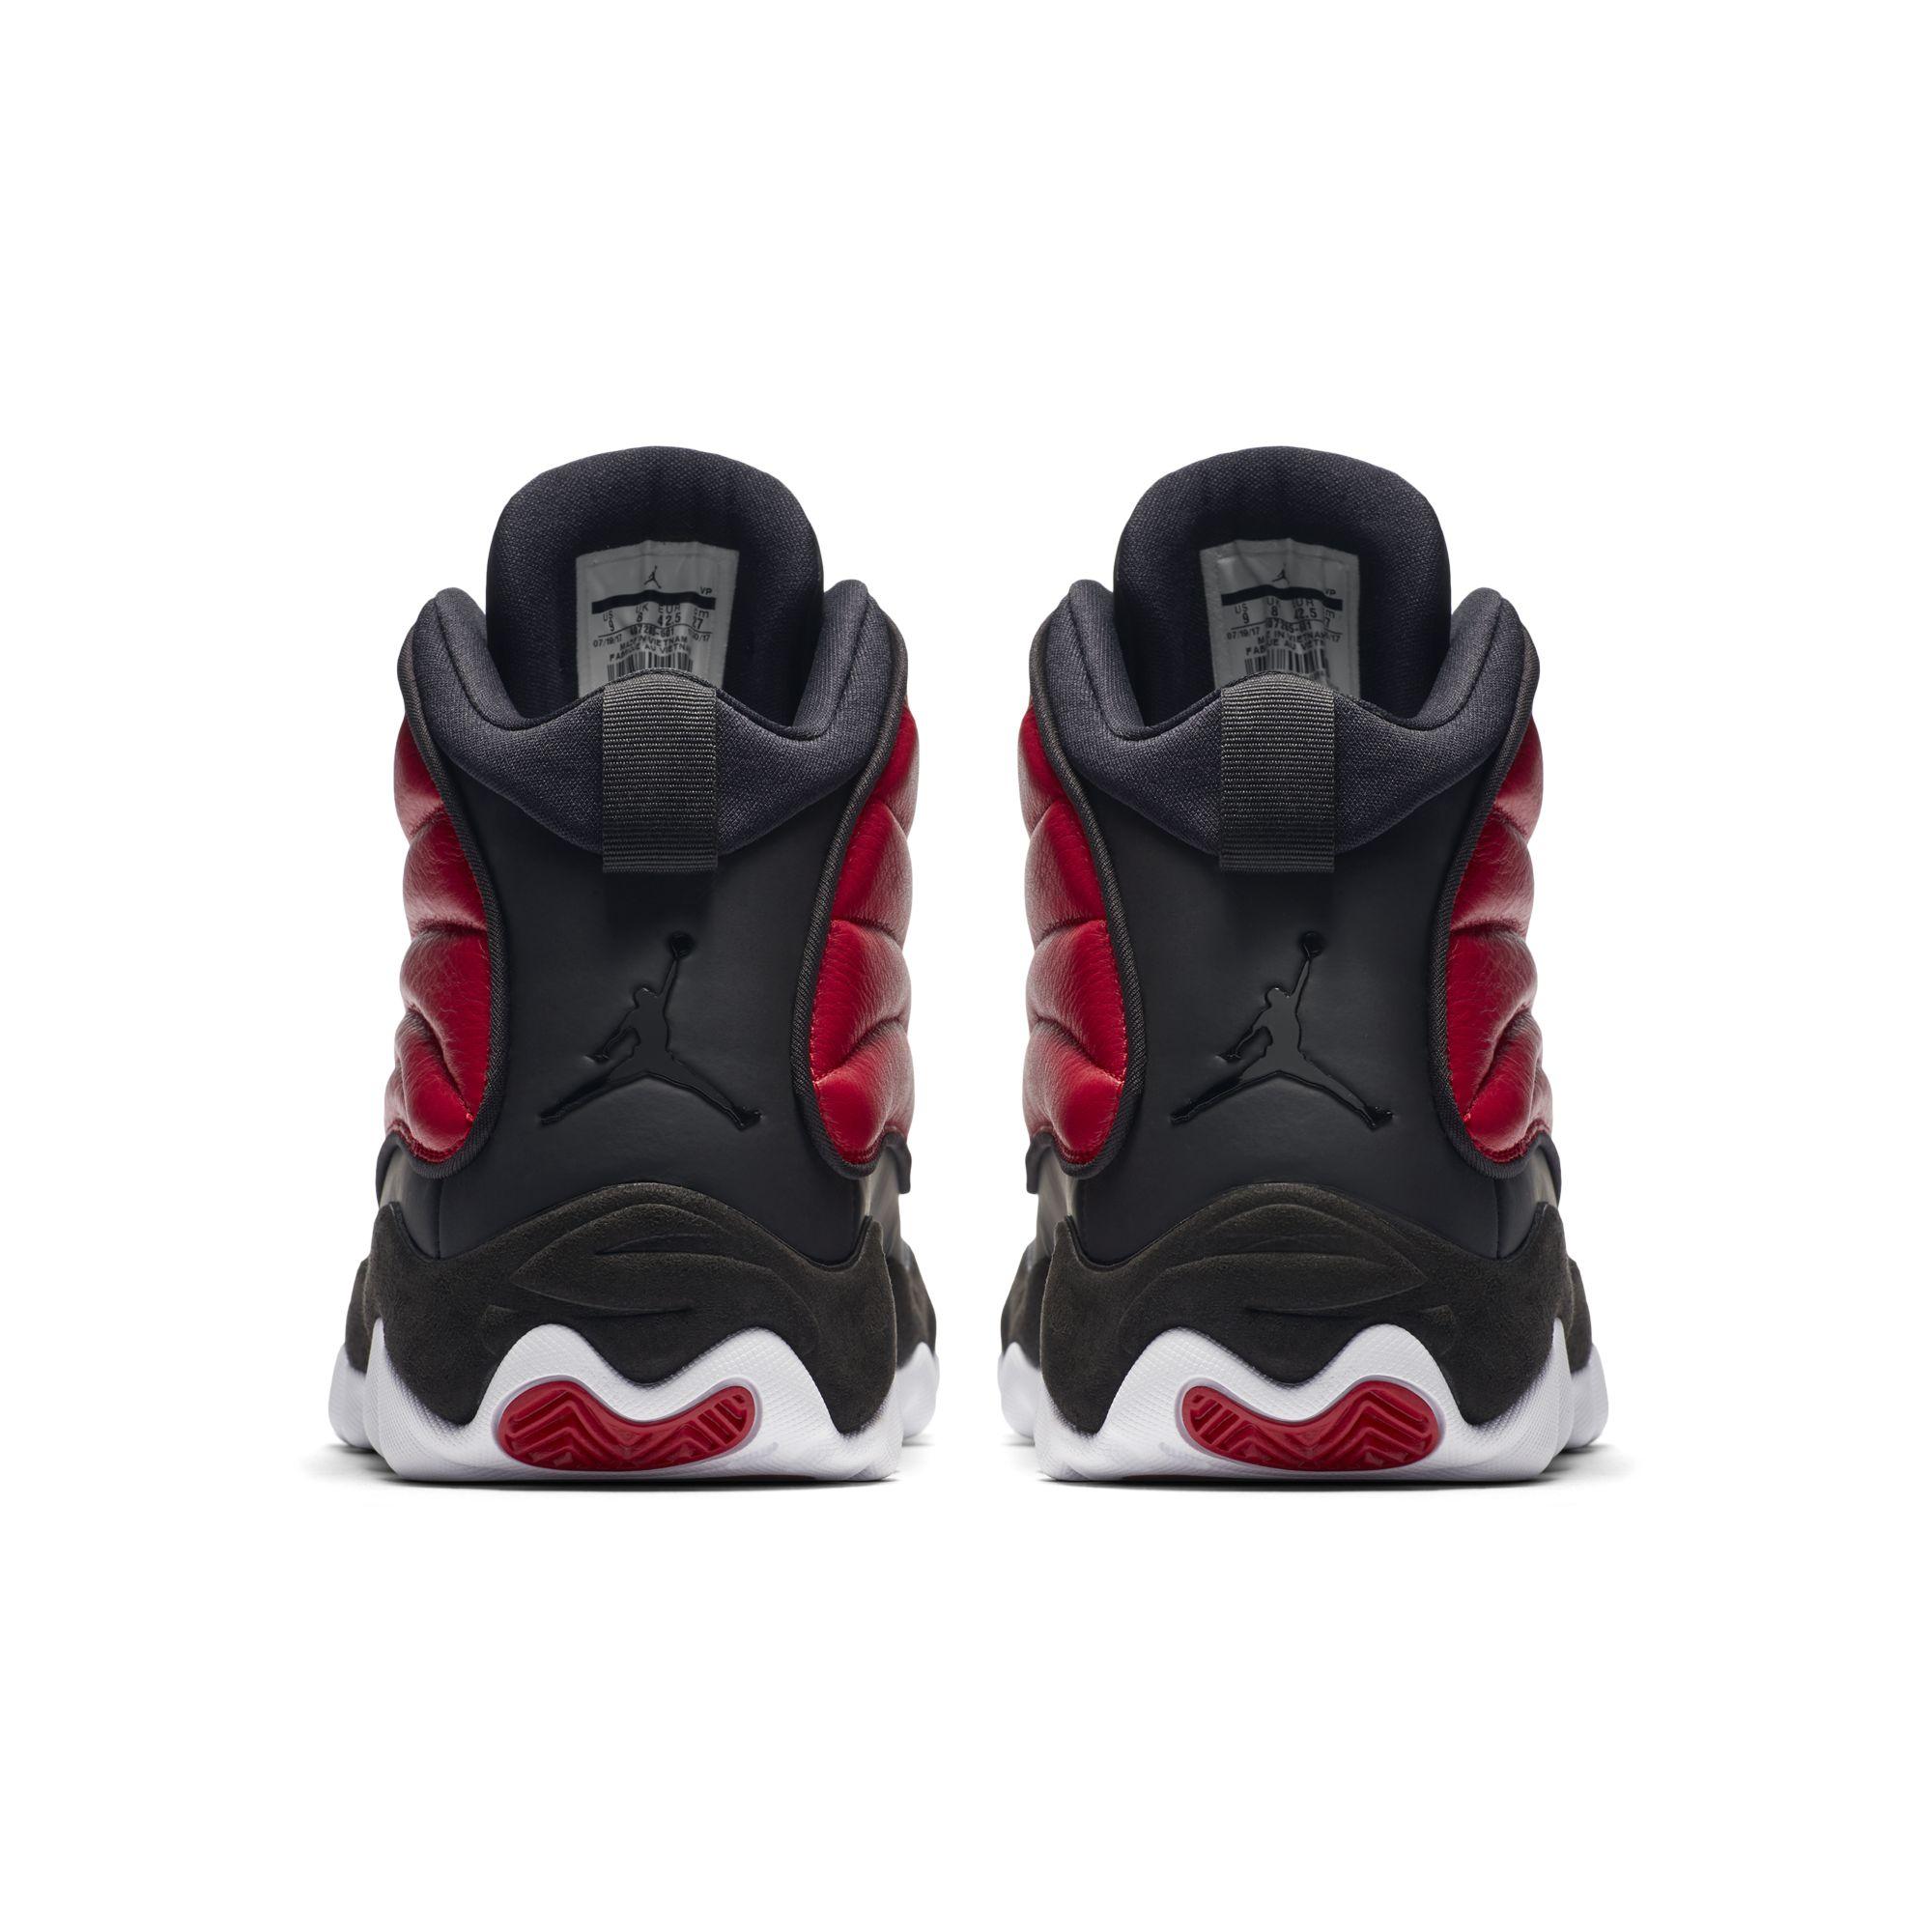 factory price 3e285 496f2 Jordan-Jumpman-Pro-Strong-Black-Red-3 - WearTesters